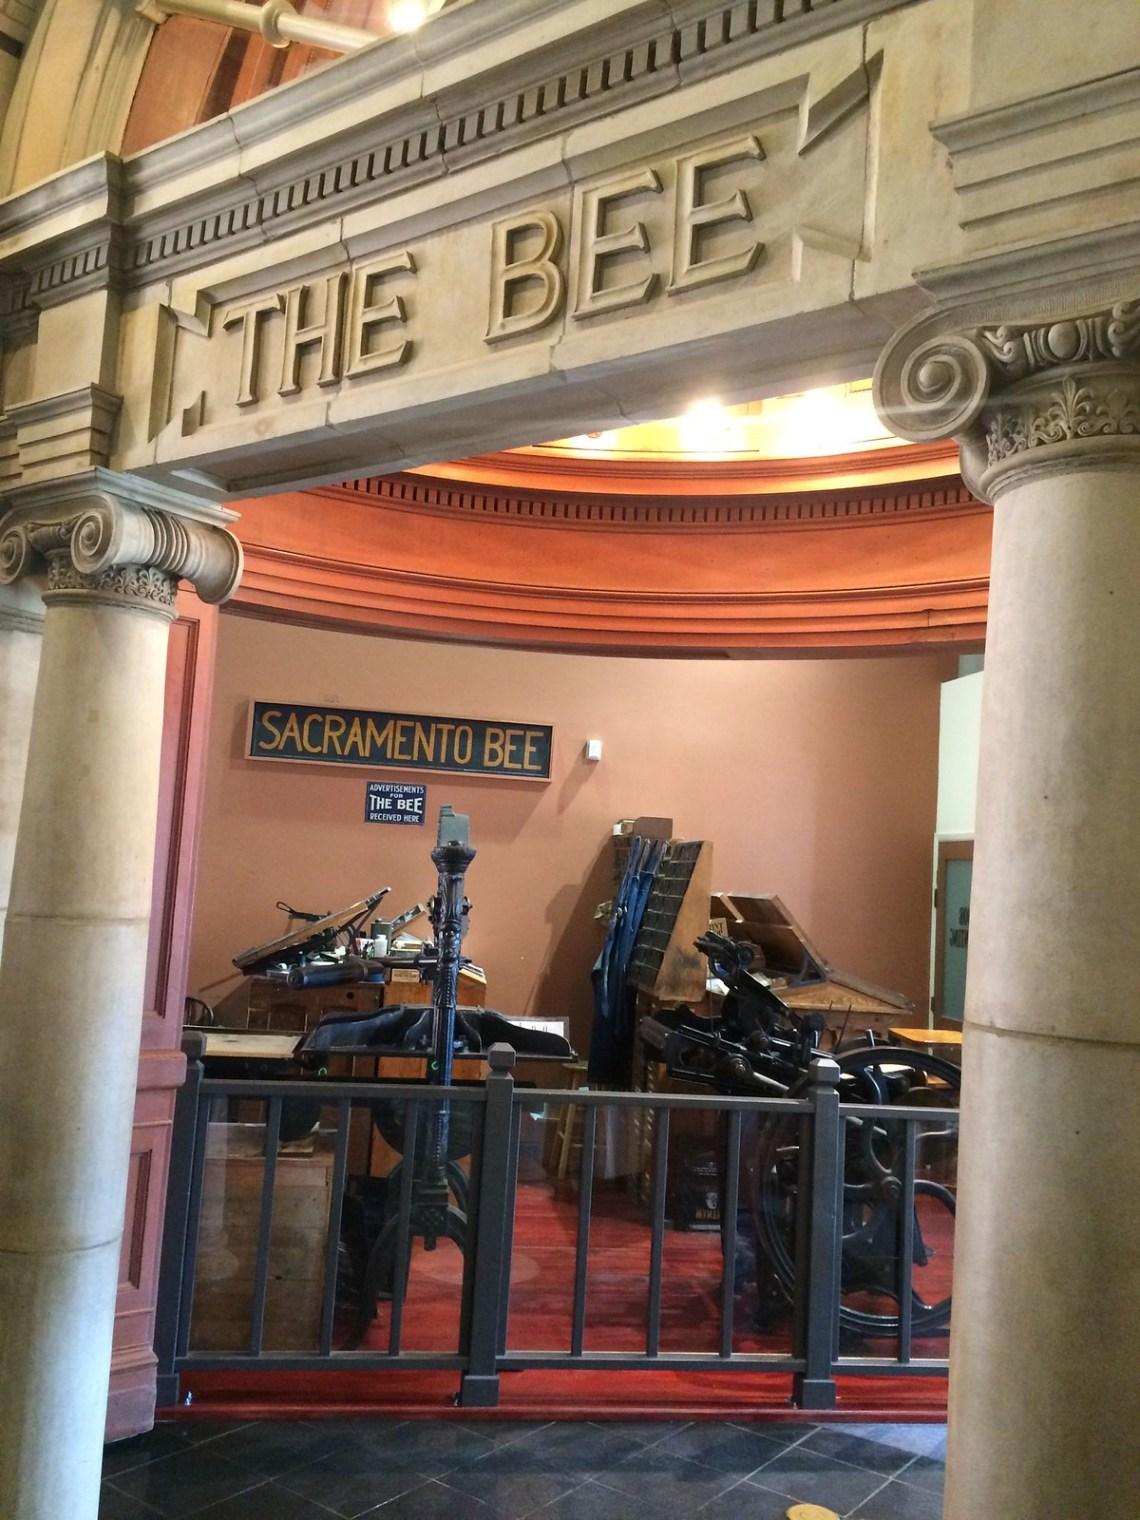 Old Sacramento Bee Equipment